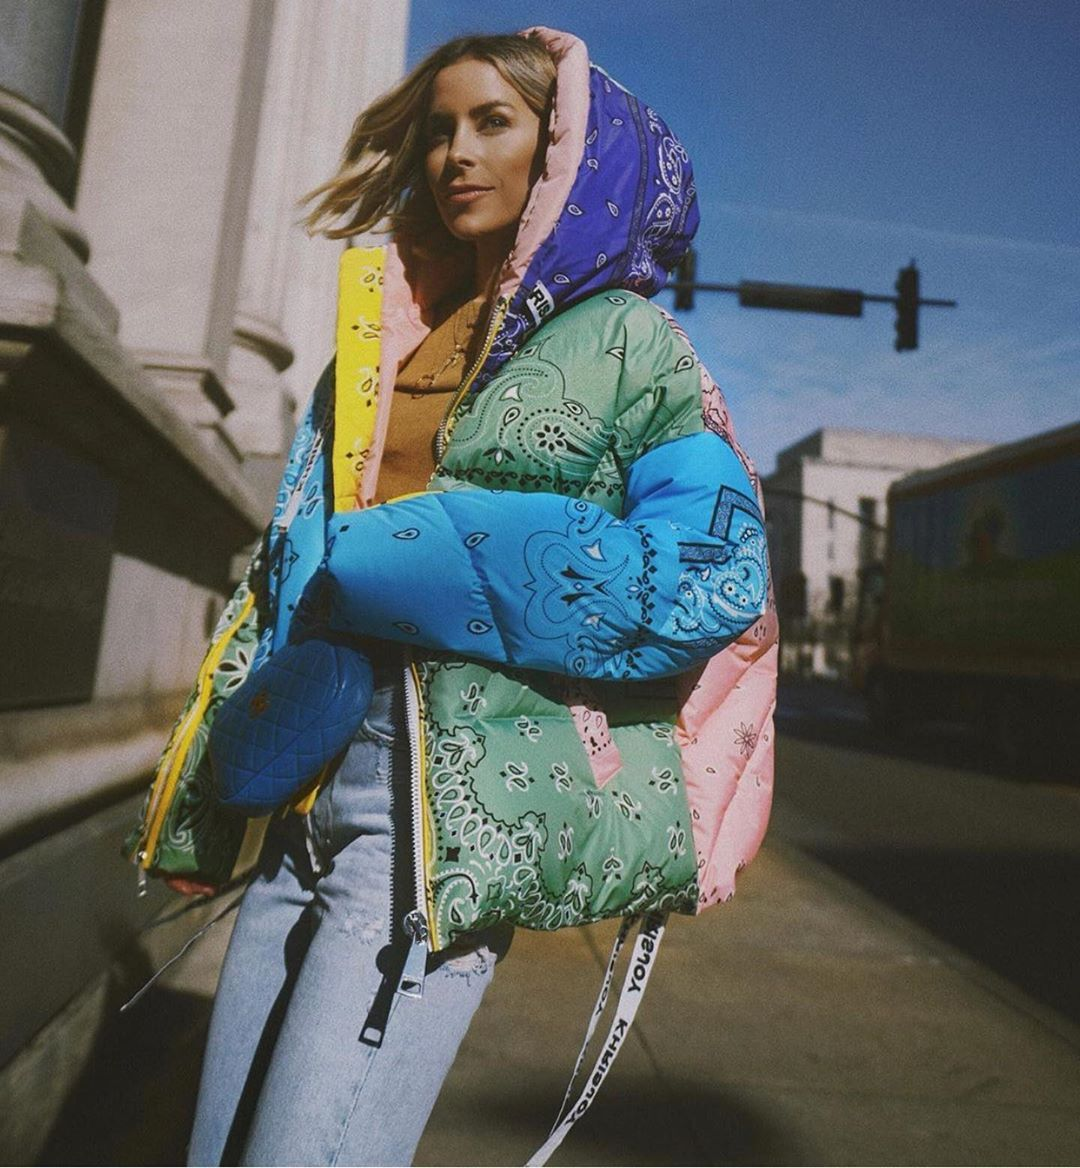 Khrisjoy S Instagram Profile Post Multicolor Bandana Jacket Marylawlesslee Khrisjoy Official Bandanajacket Bandana Outfit Streetwear Fashion Love Fashion [ 1168 x 1080 Pixel ]